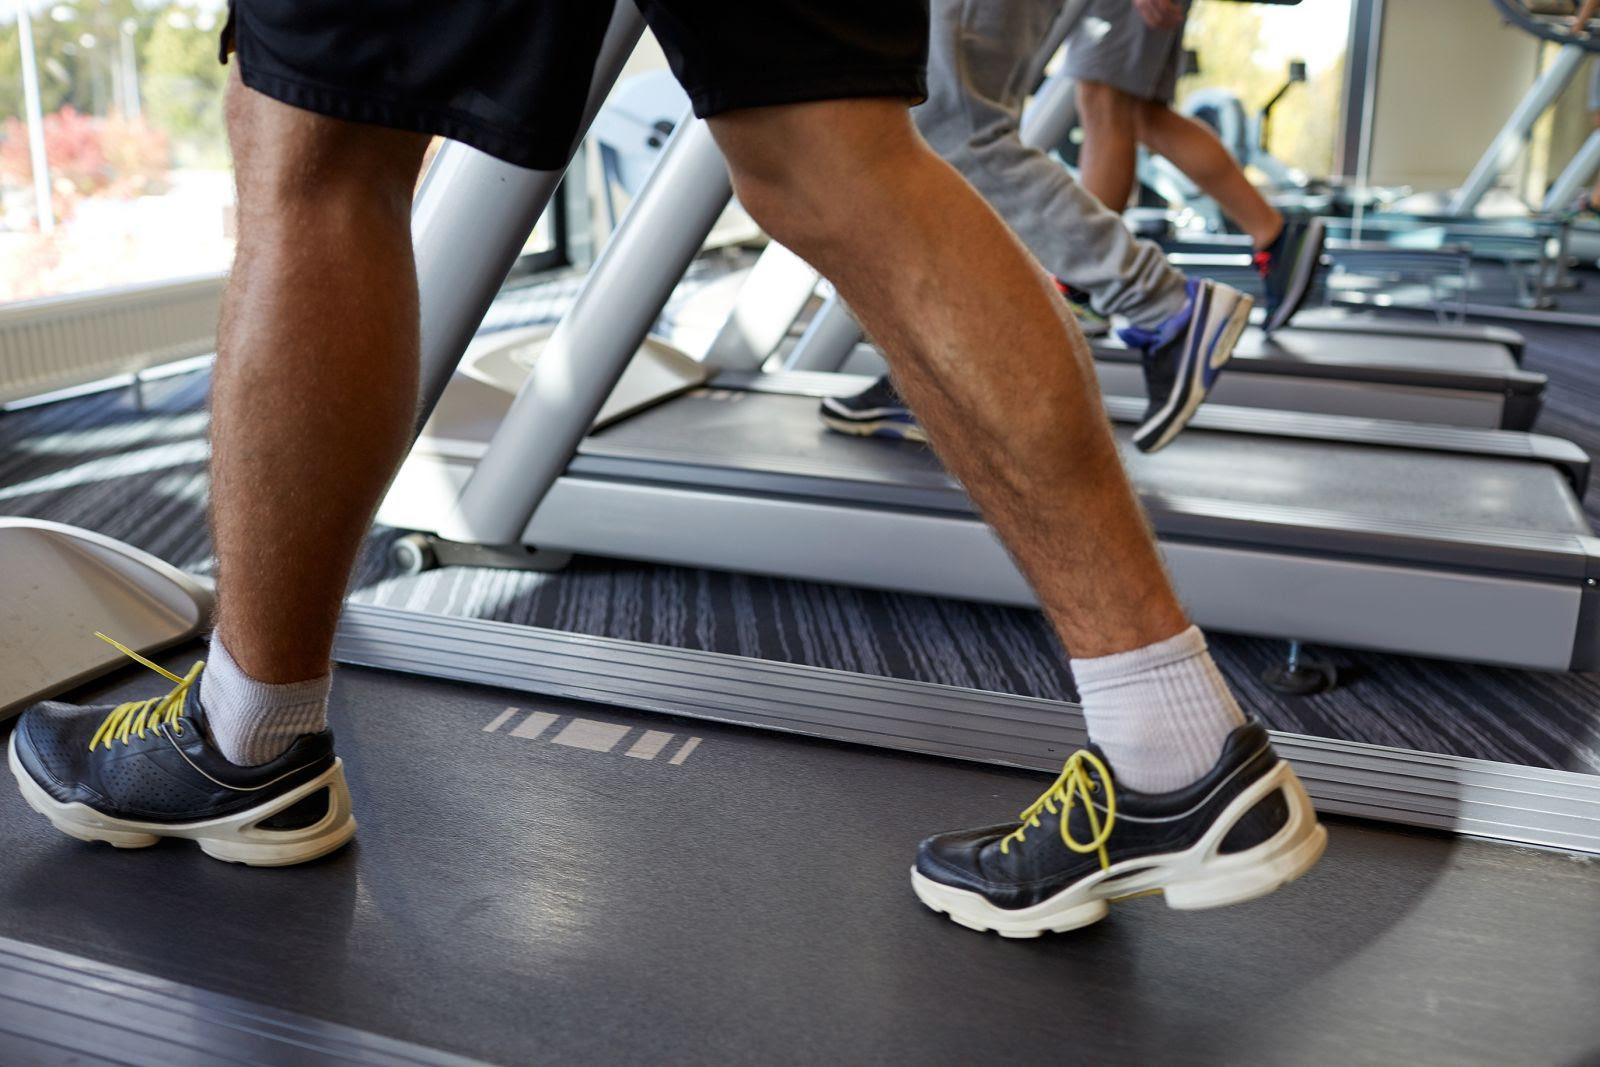 4 ways exercise helps arthritis